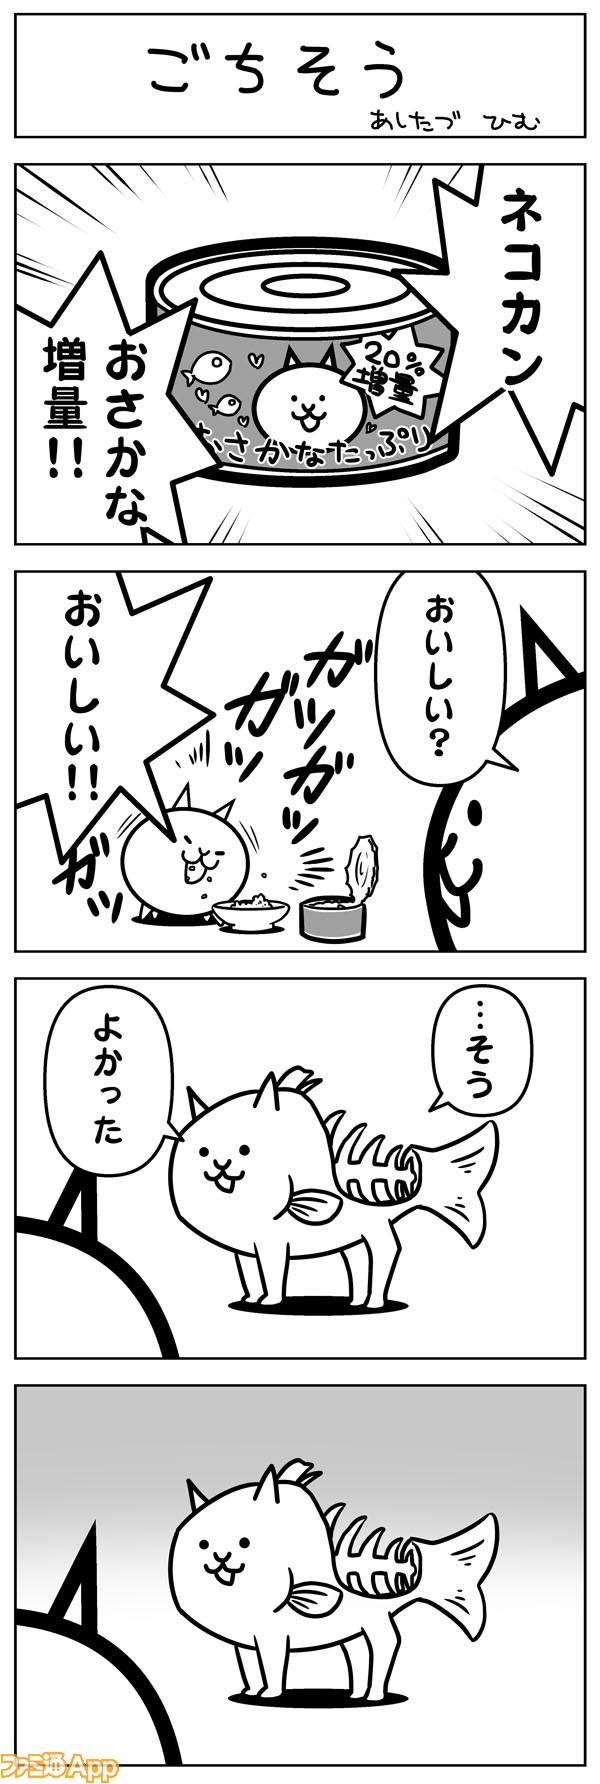 08asit_053